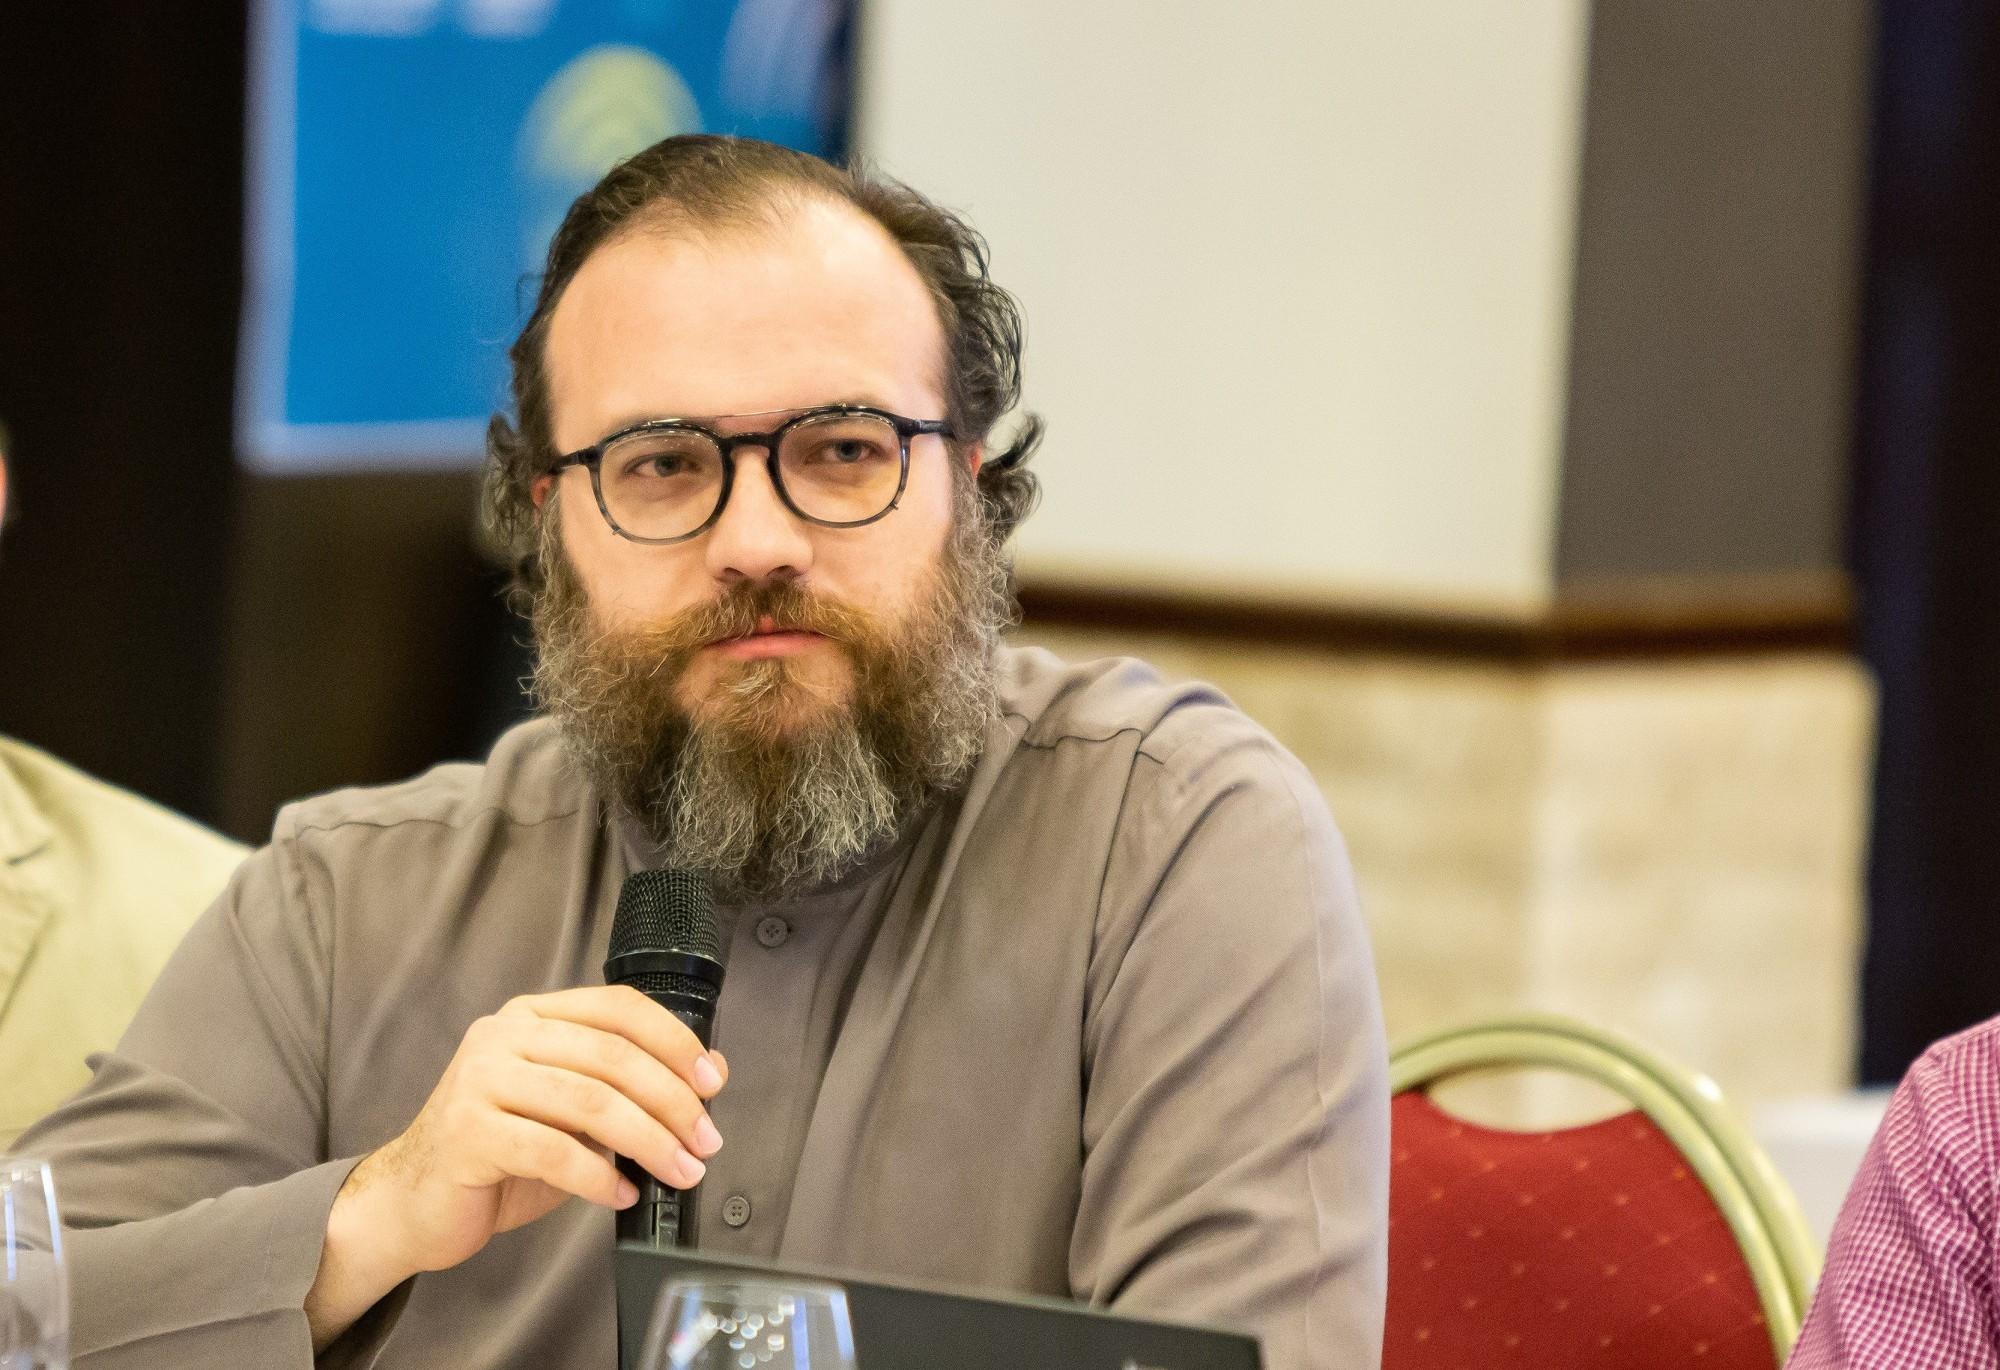 Ionut Tata